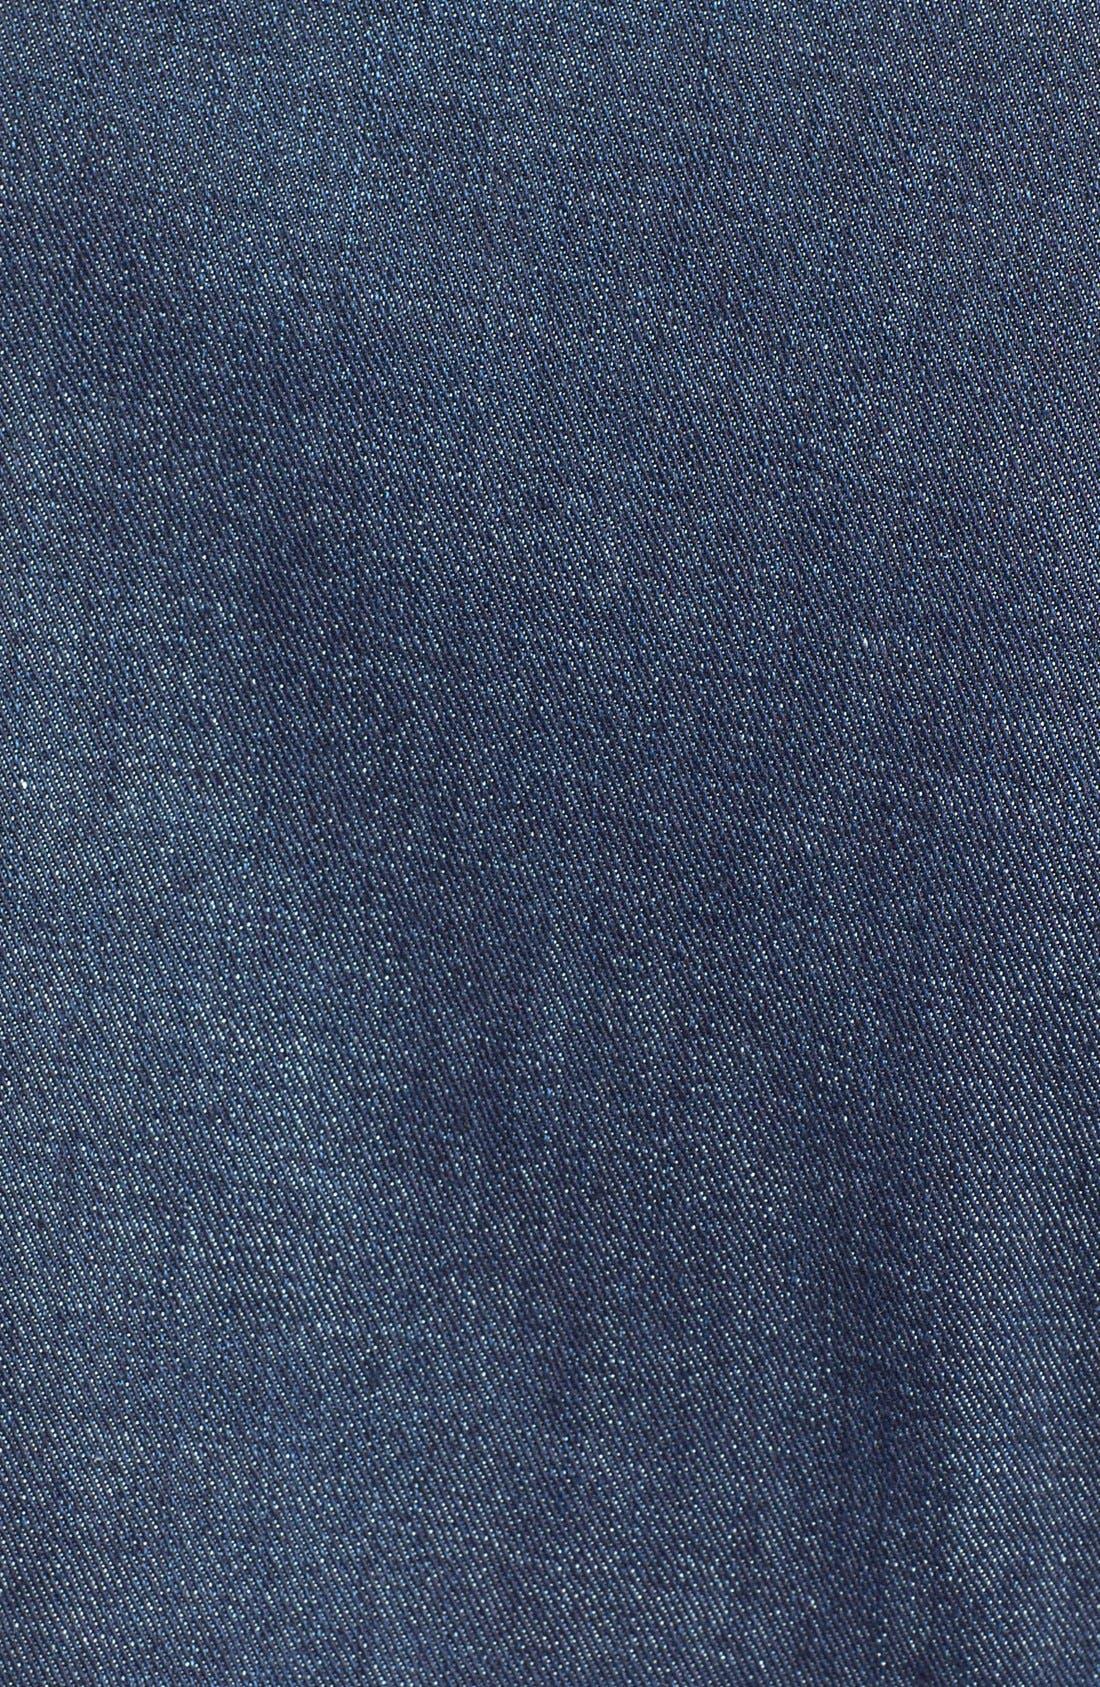 Alternate Image 3  - Lucky Brand 'Sabrina' Leather Sleeve Denim Jacket